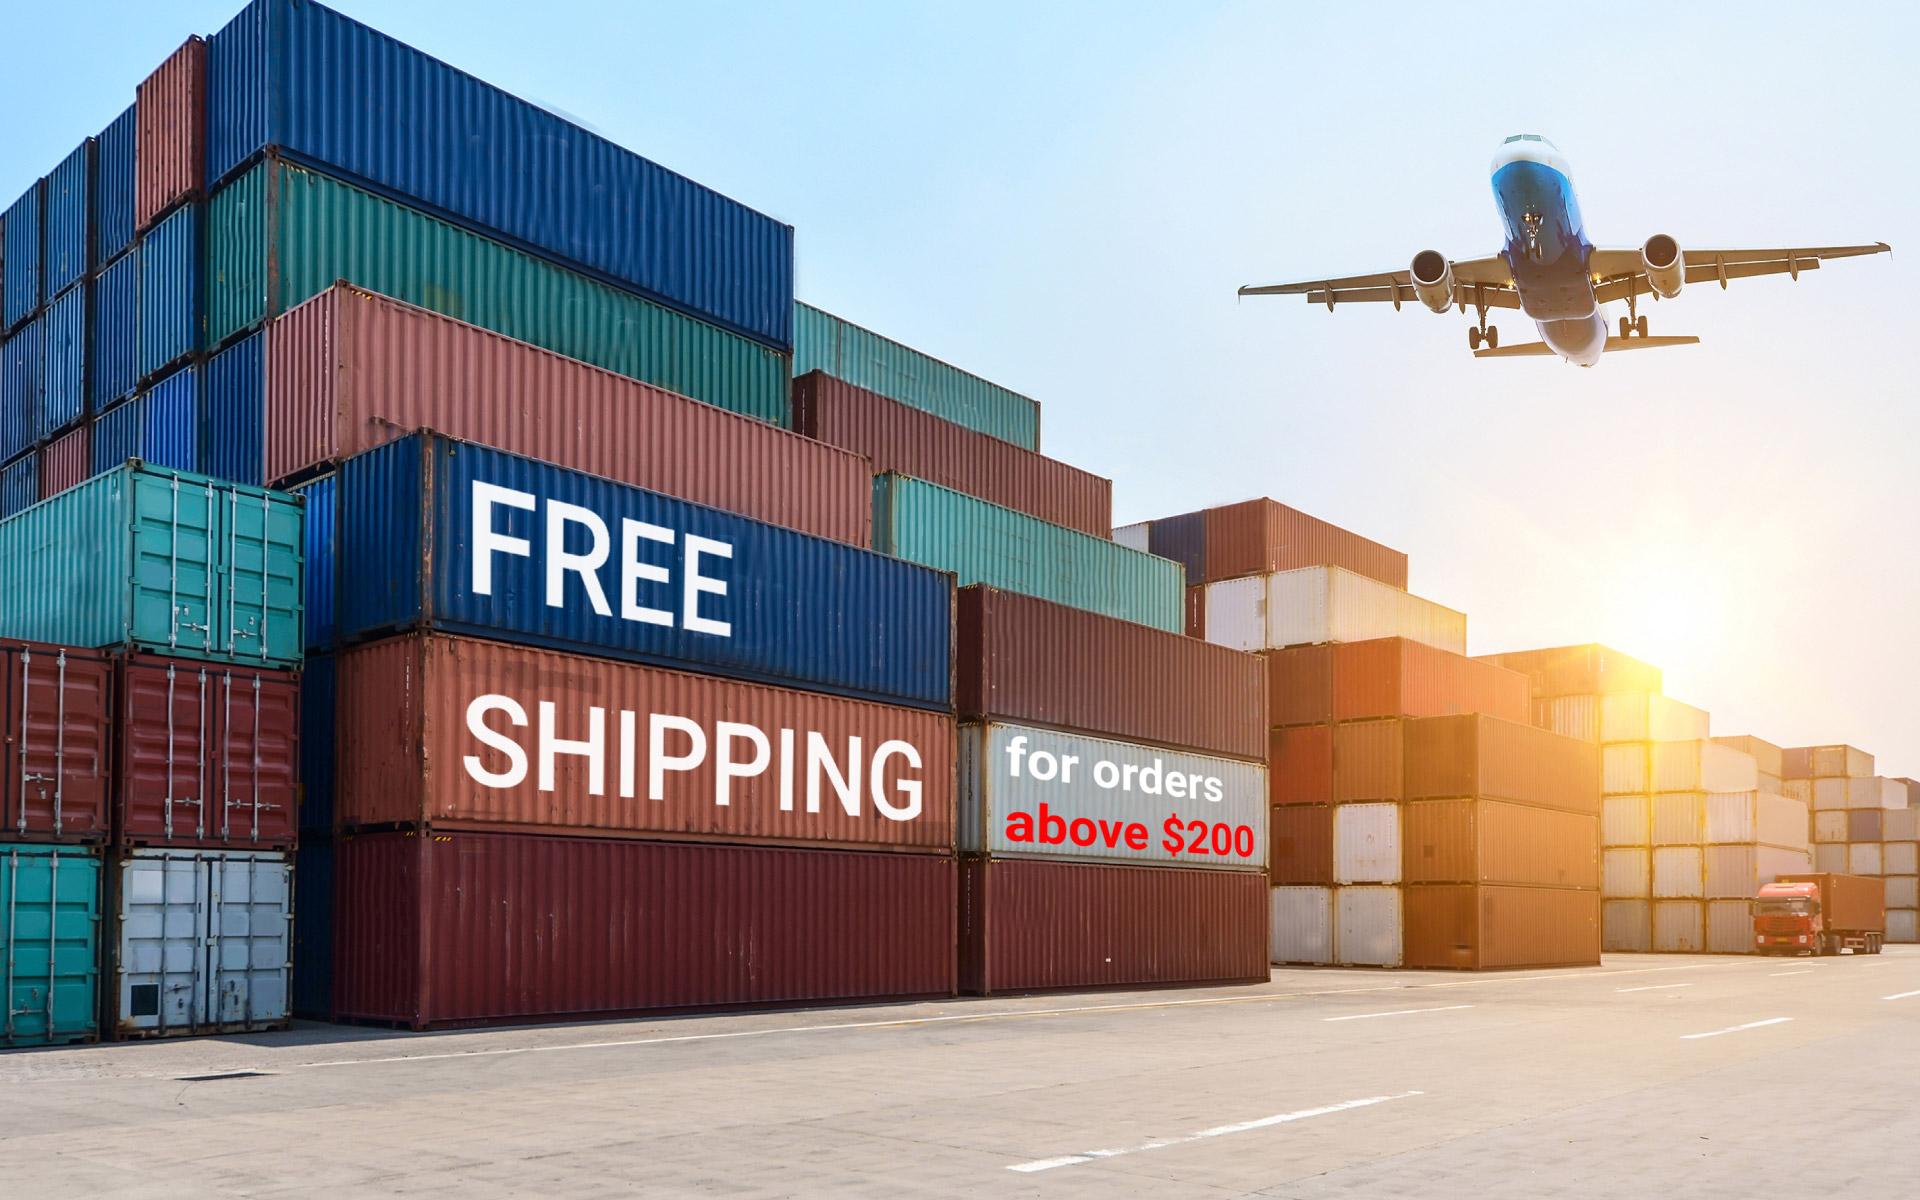 Free shipment for orders above $200 - start ordering now!